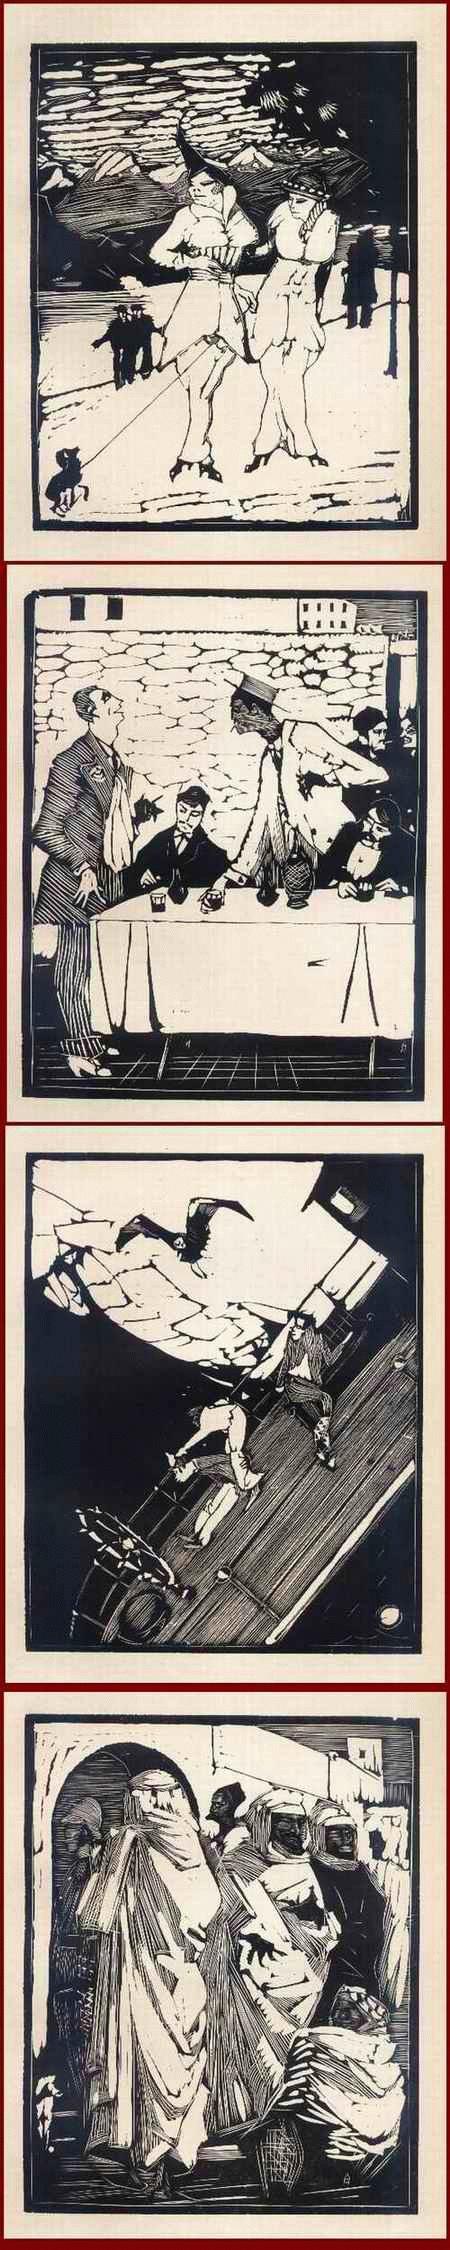 Arminius Hasemann - KOKOTTEN - GENUA - STURM - ARABER i.MELILLA - 4 OriginalHolzschnitte d.abenteuerlichen Wanderers1915 kopen? Bied vanaf 65!